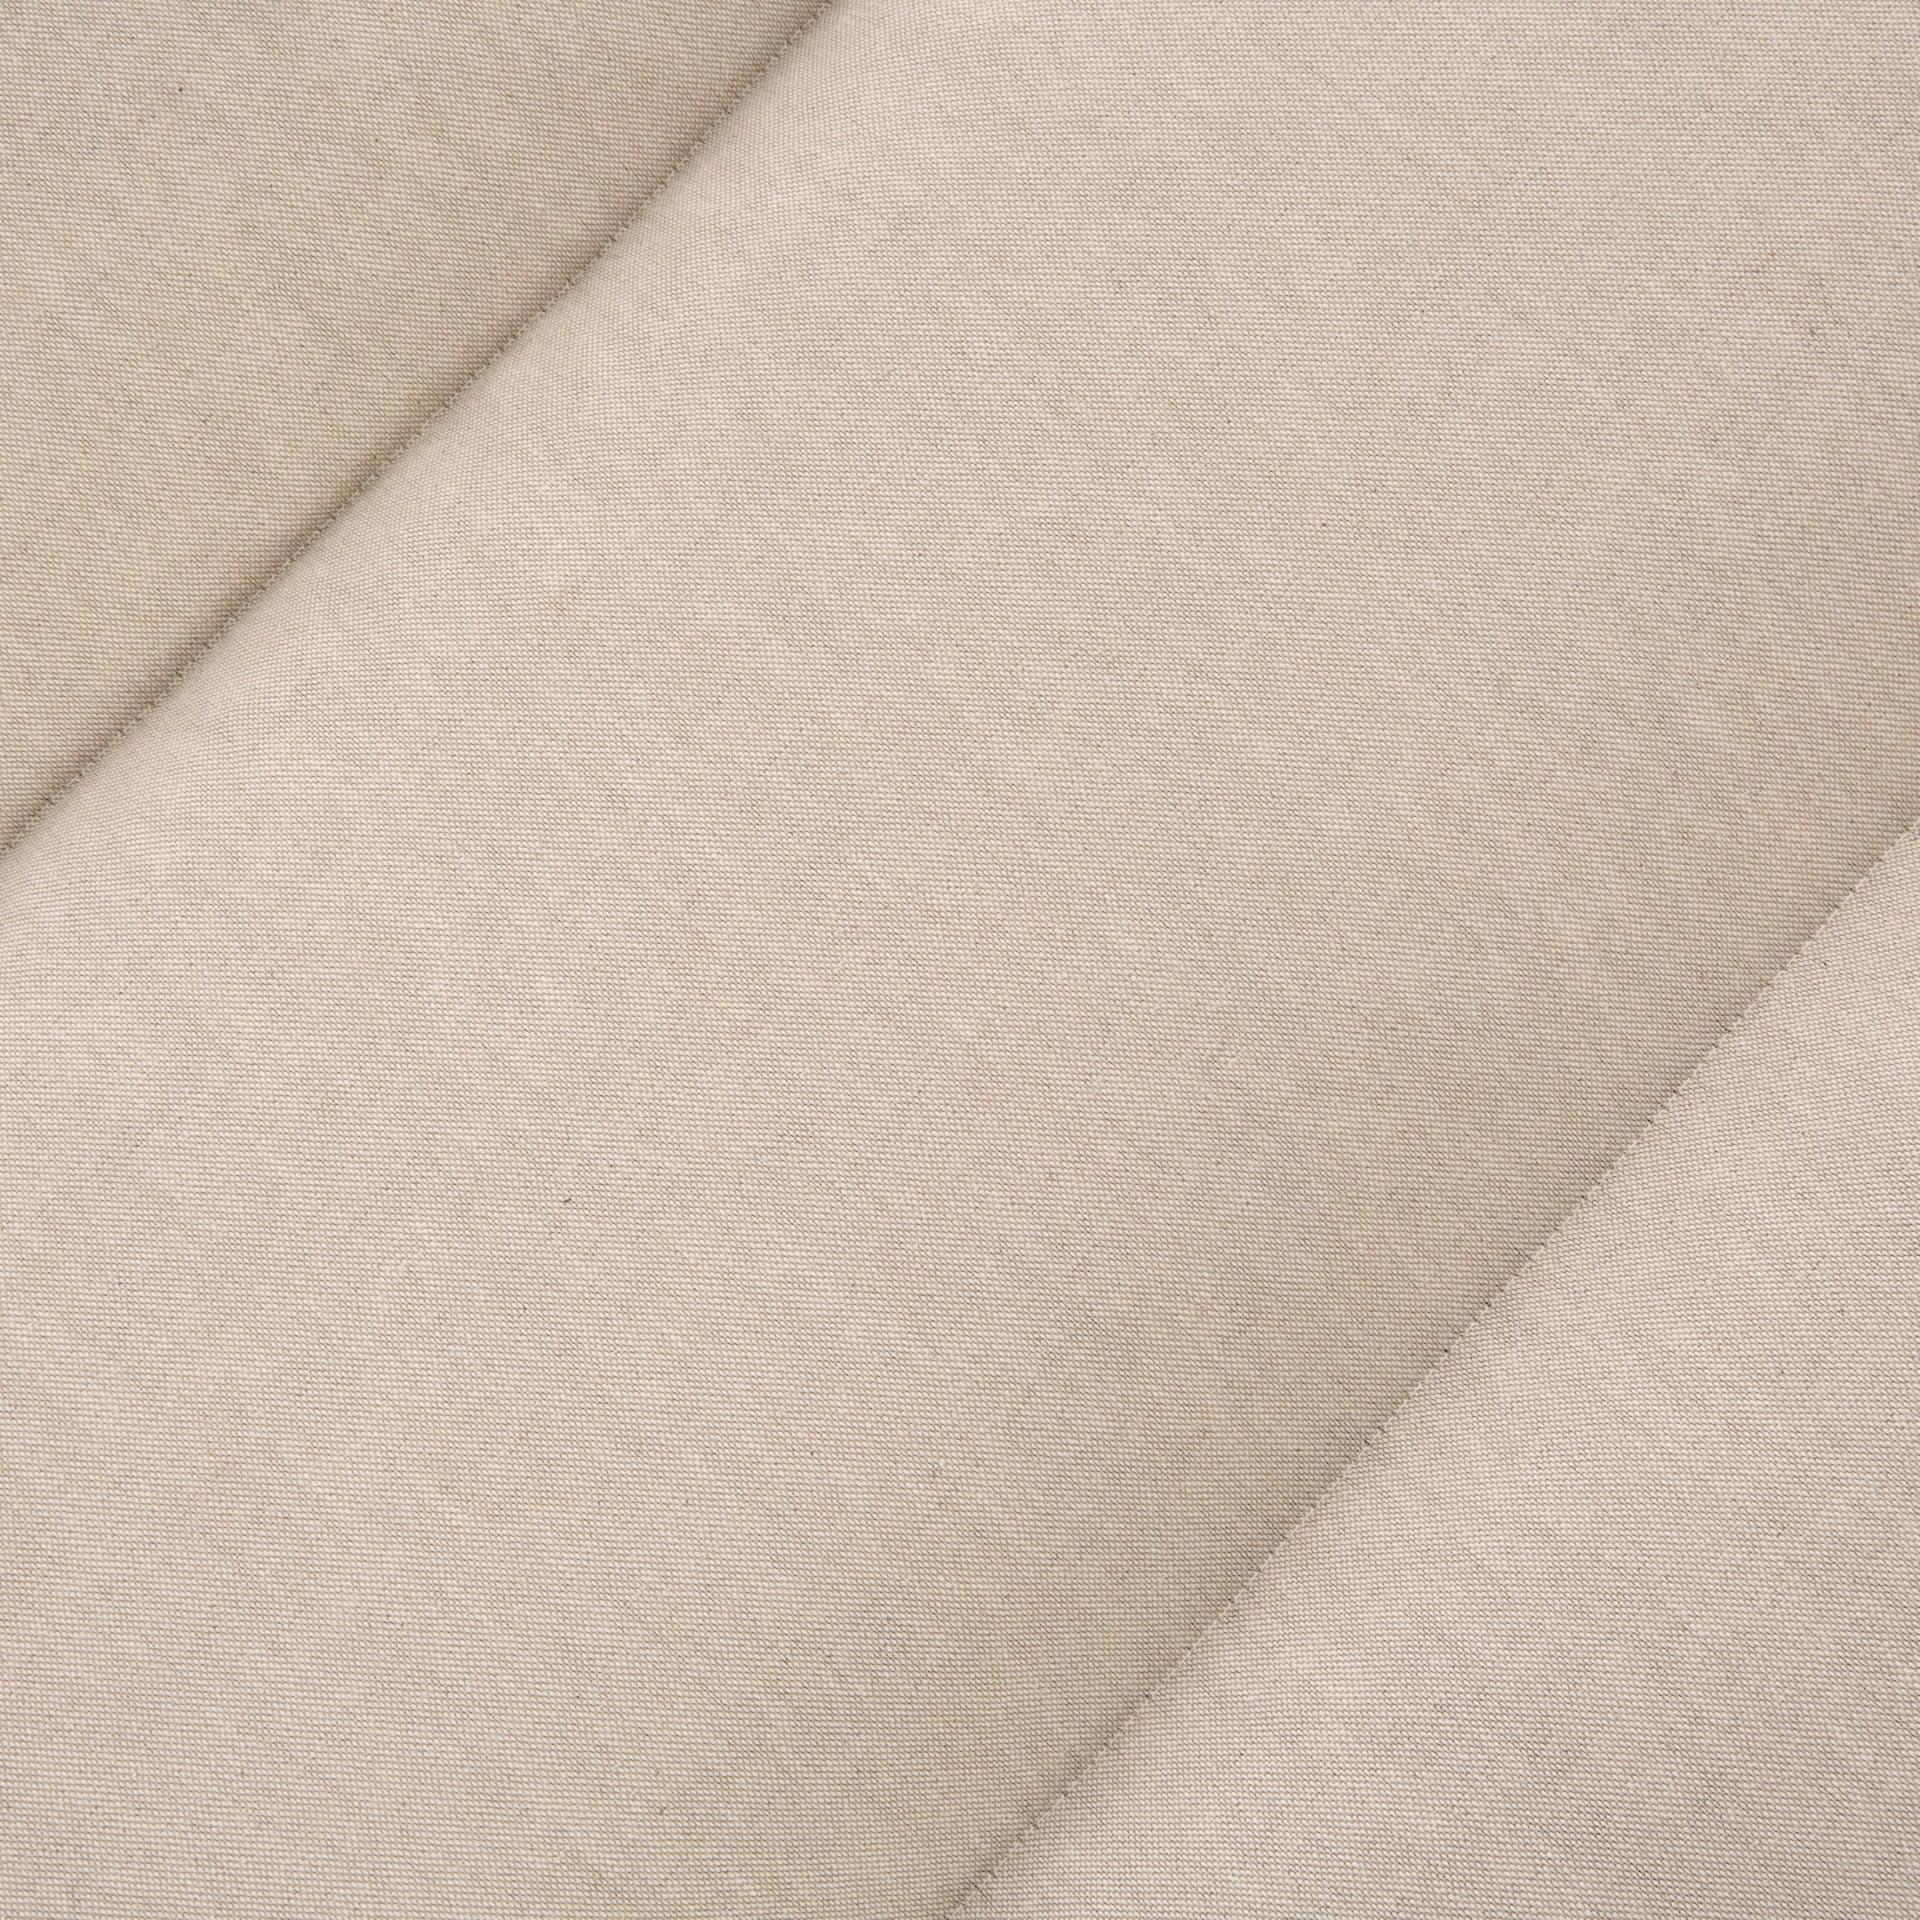 Cuscino da esterno BRASILE multicolore 120 x 80 x Sp 80 cm , 4 pezzi - 14